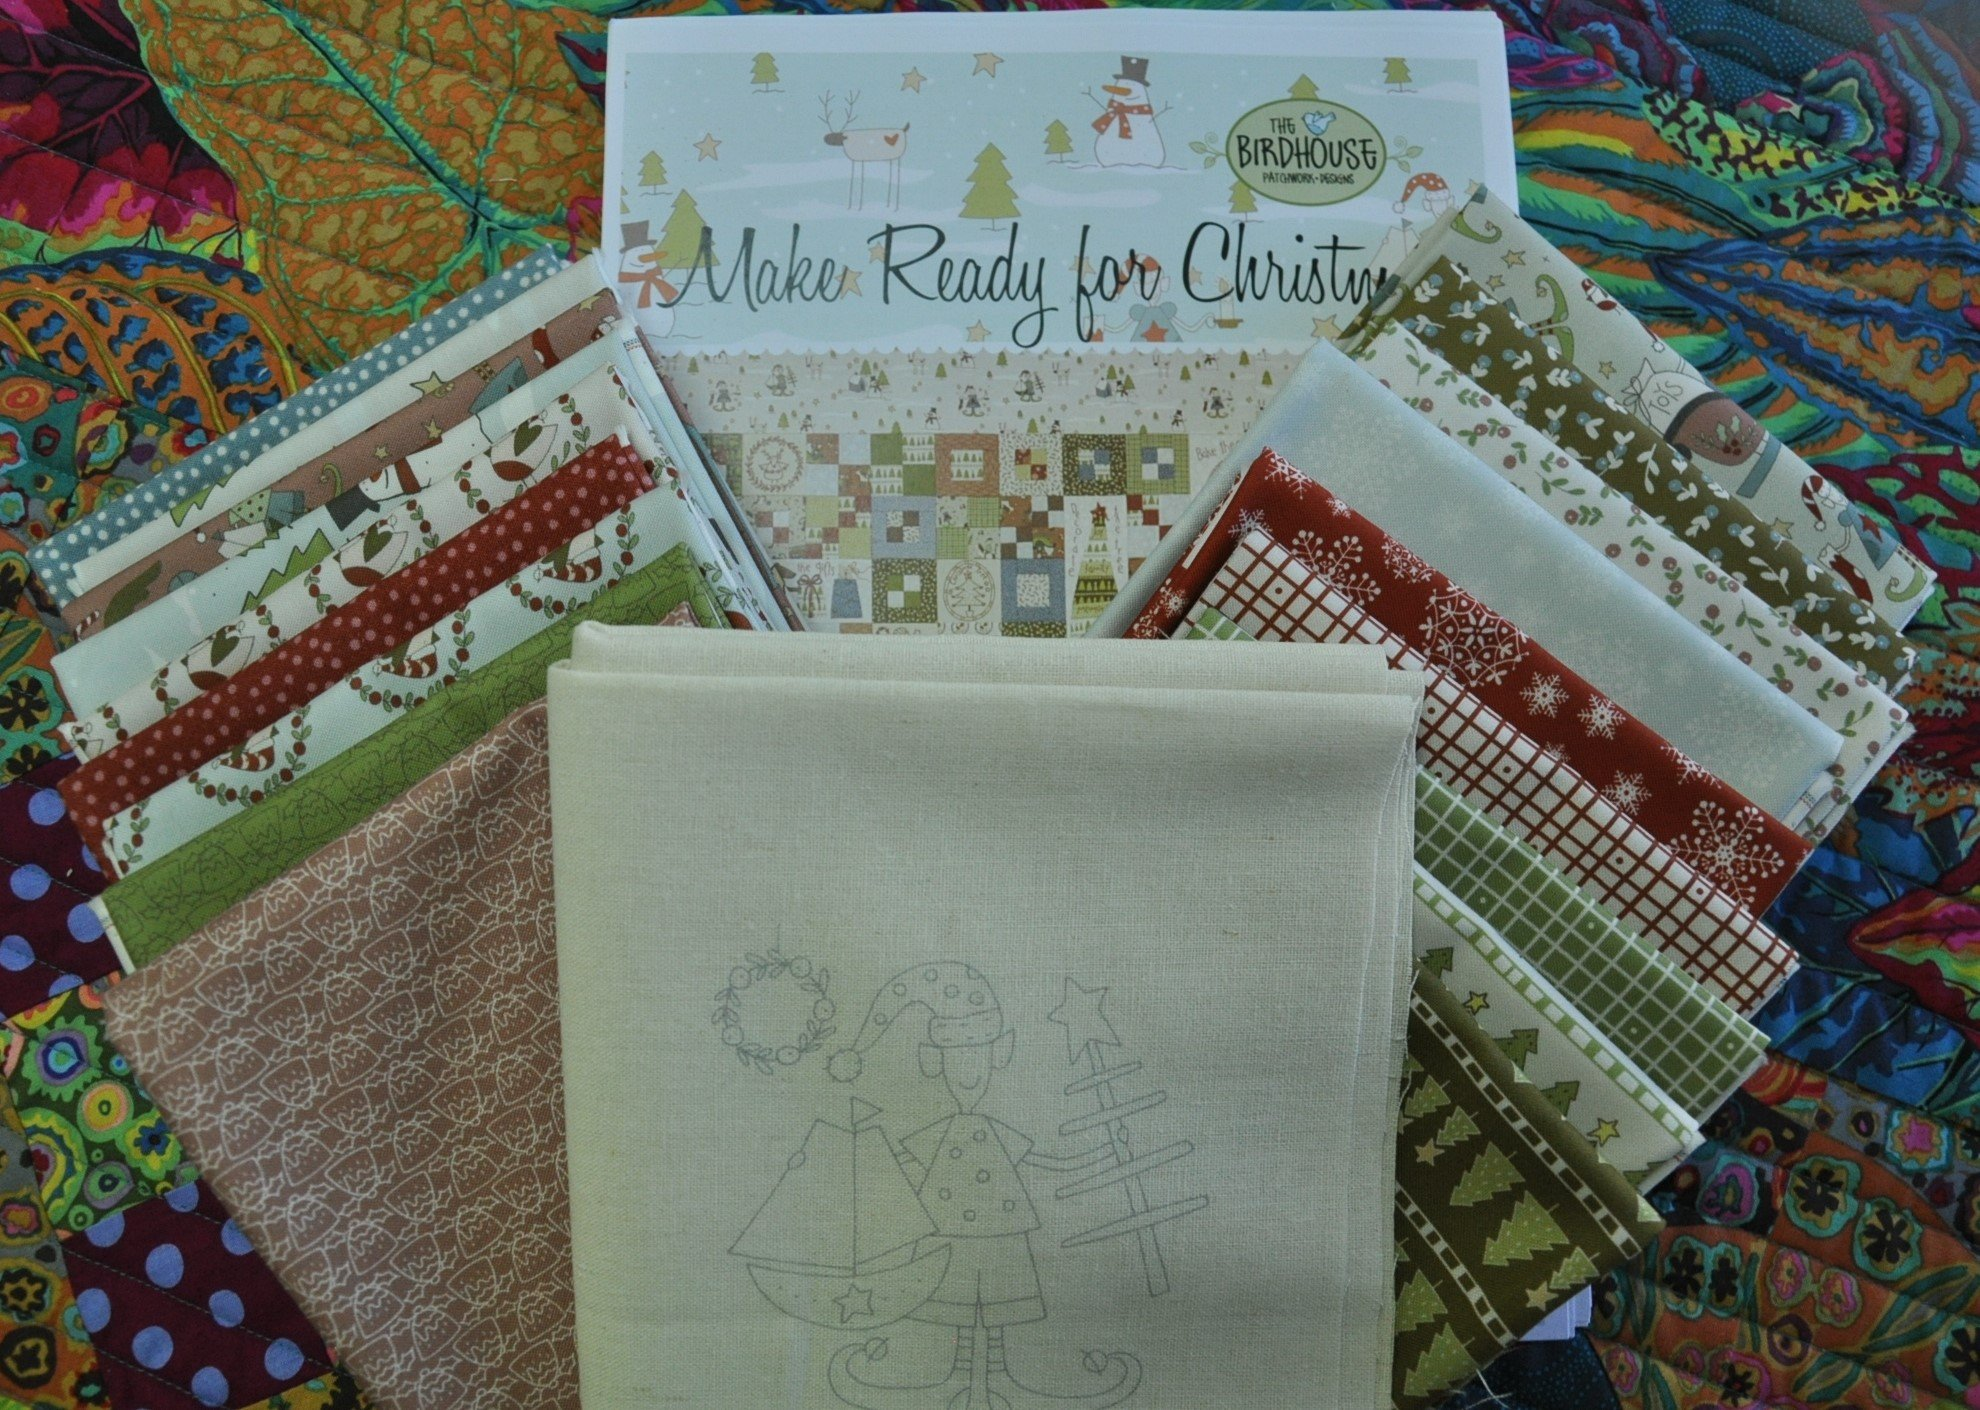 Make Ready for Christmas Kit